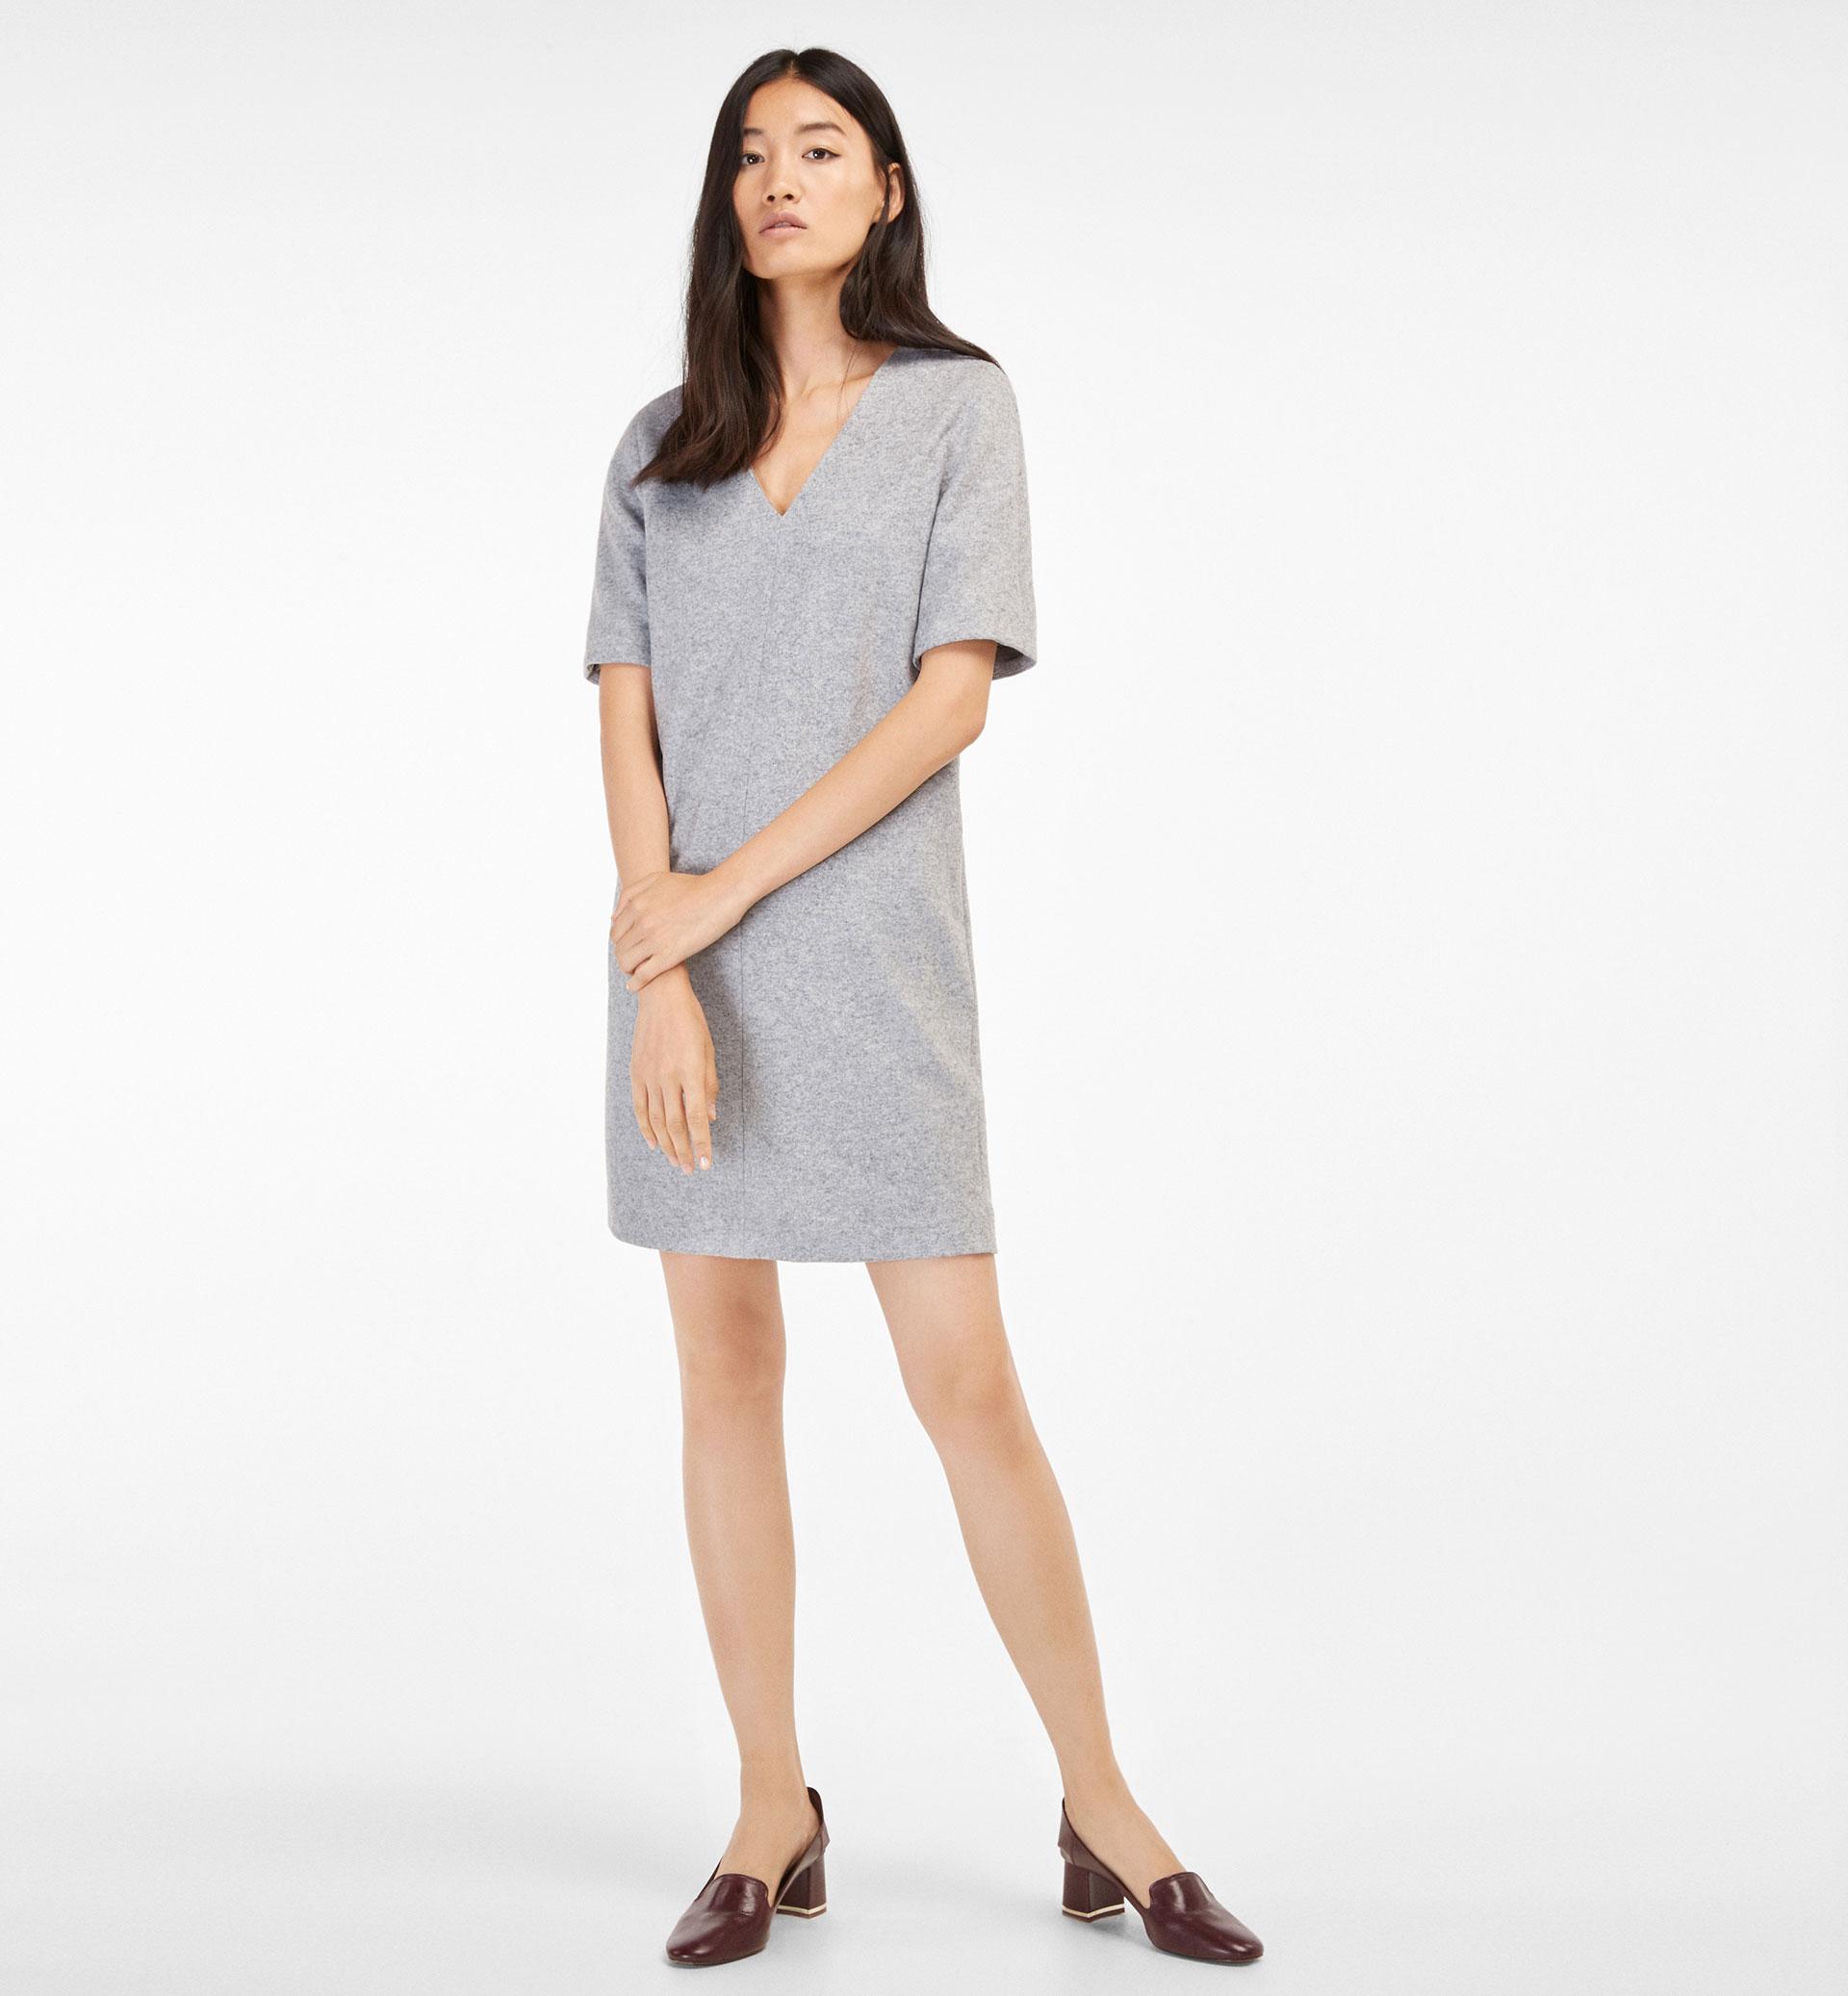 GREY DRESS WITH V-NECK